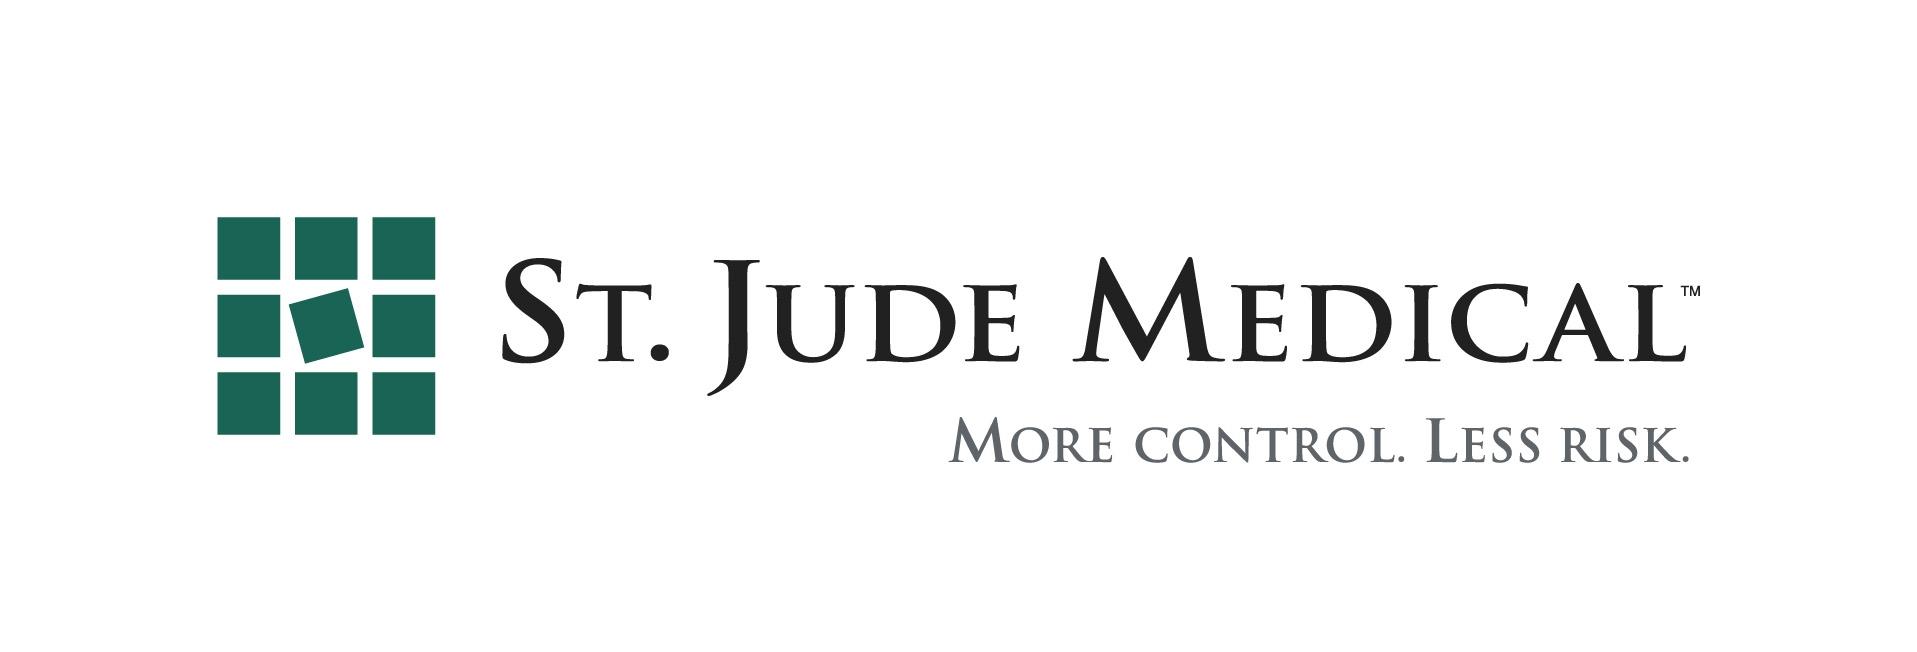 st-jude-medical-inc-logo.jpg